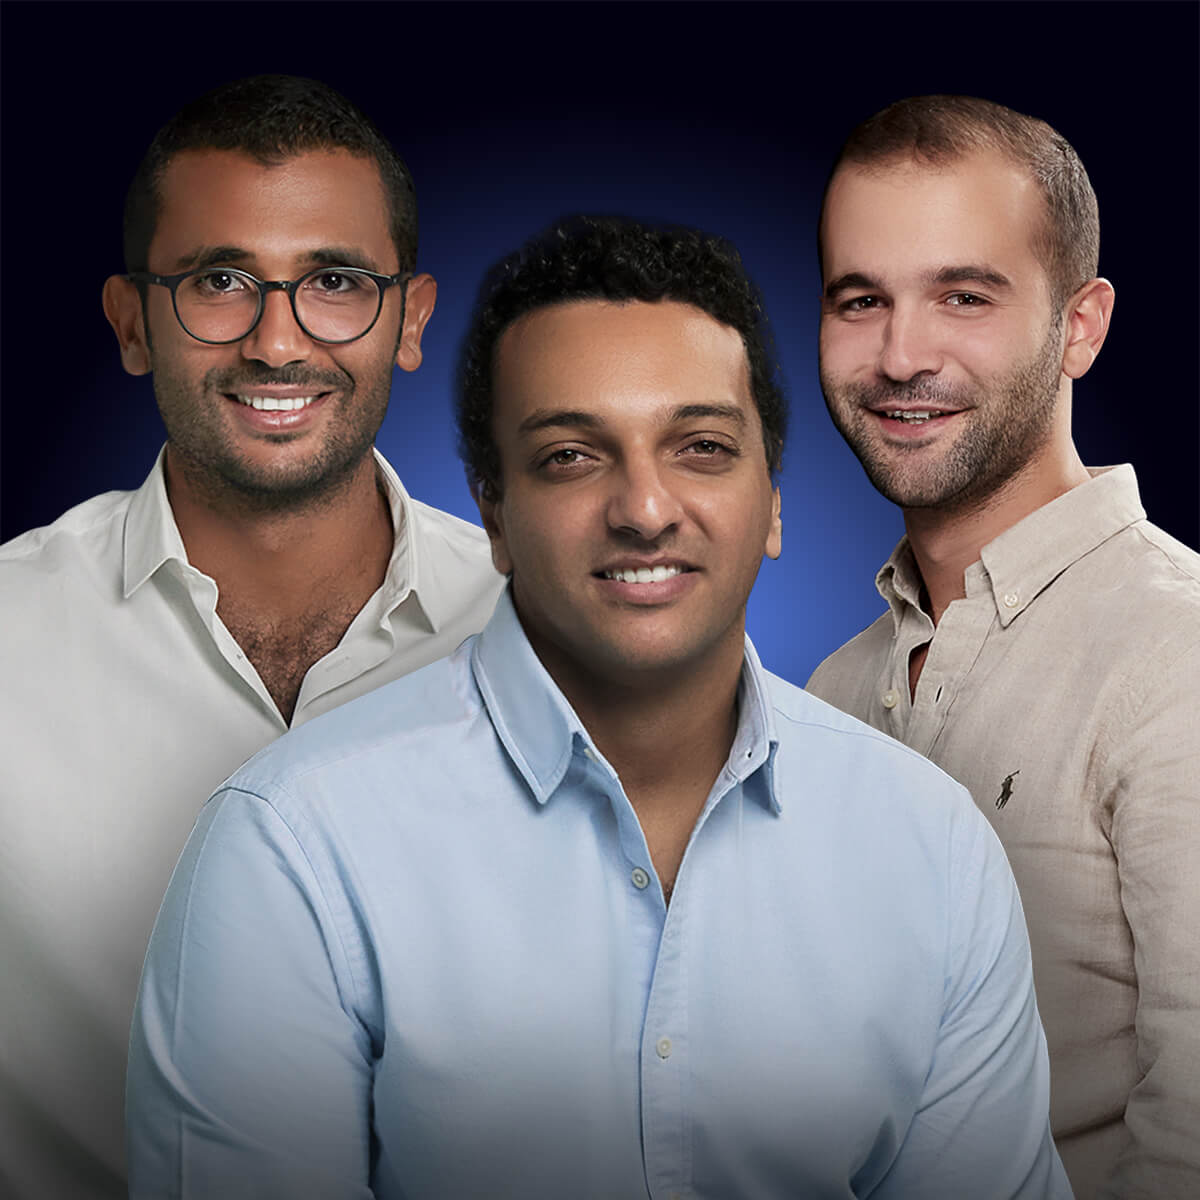 Alain El Hajj; Mostafa Menessy; Islam Shawky